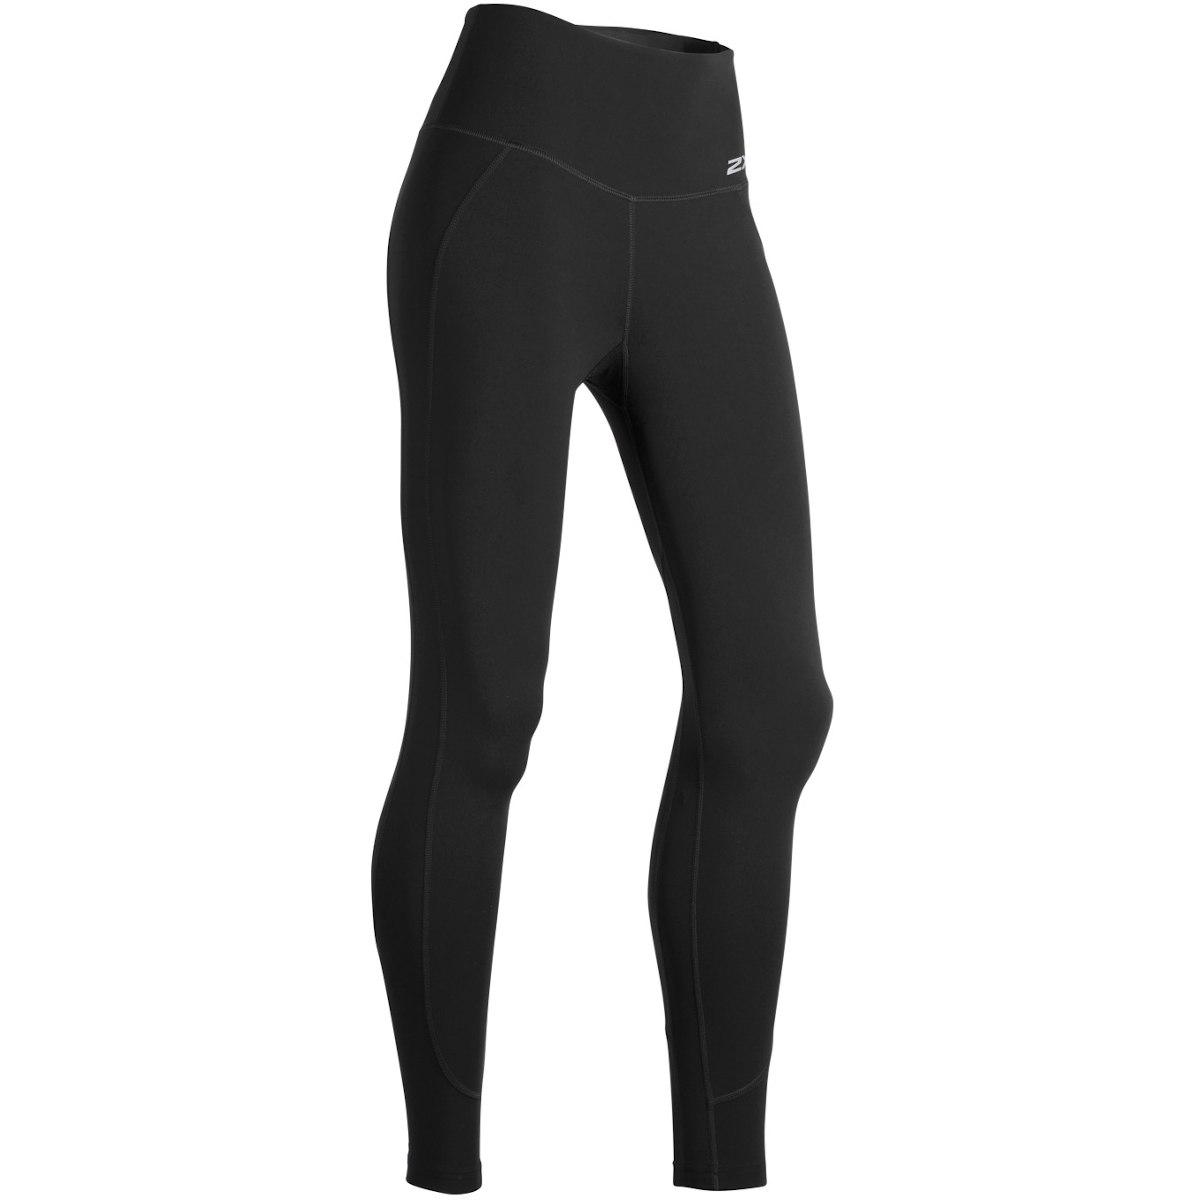 2XU Women's Fitness Hi-Rise Compression Tights - black/black